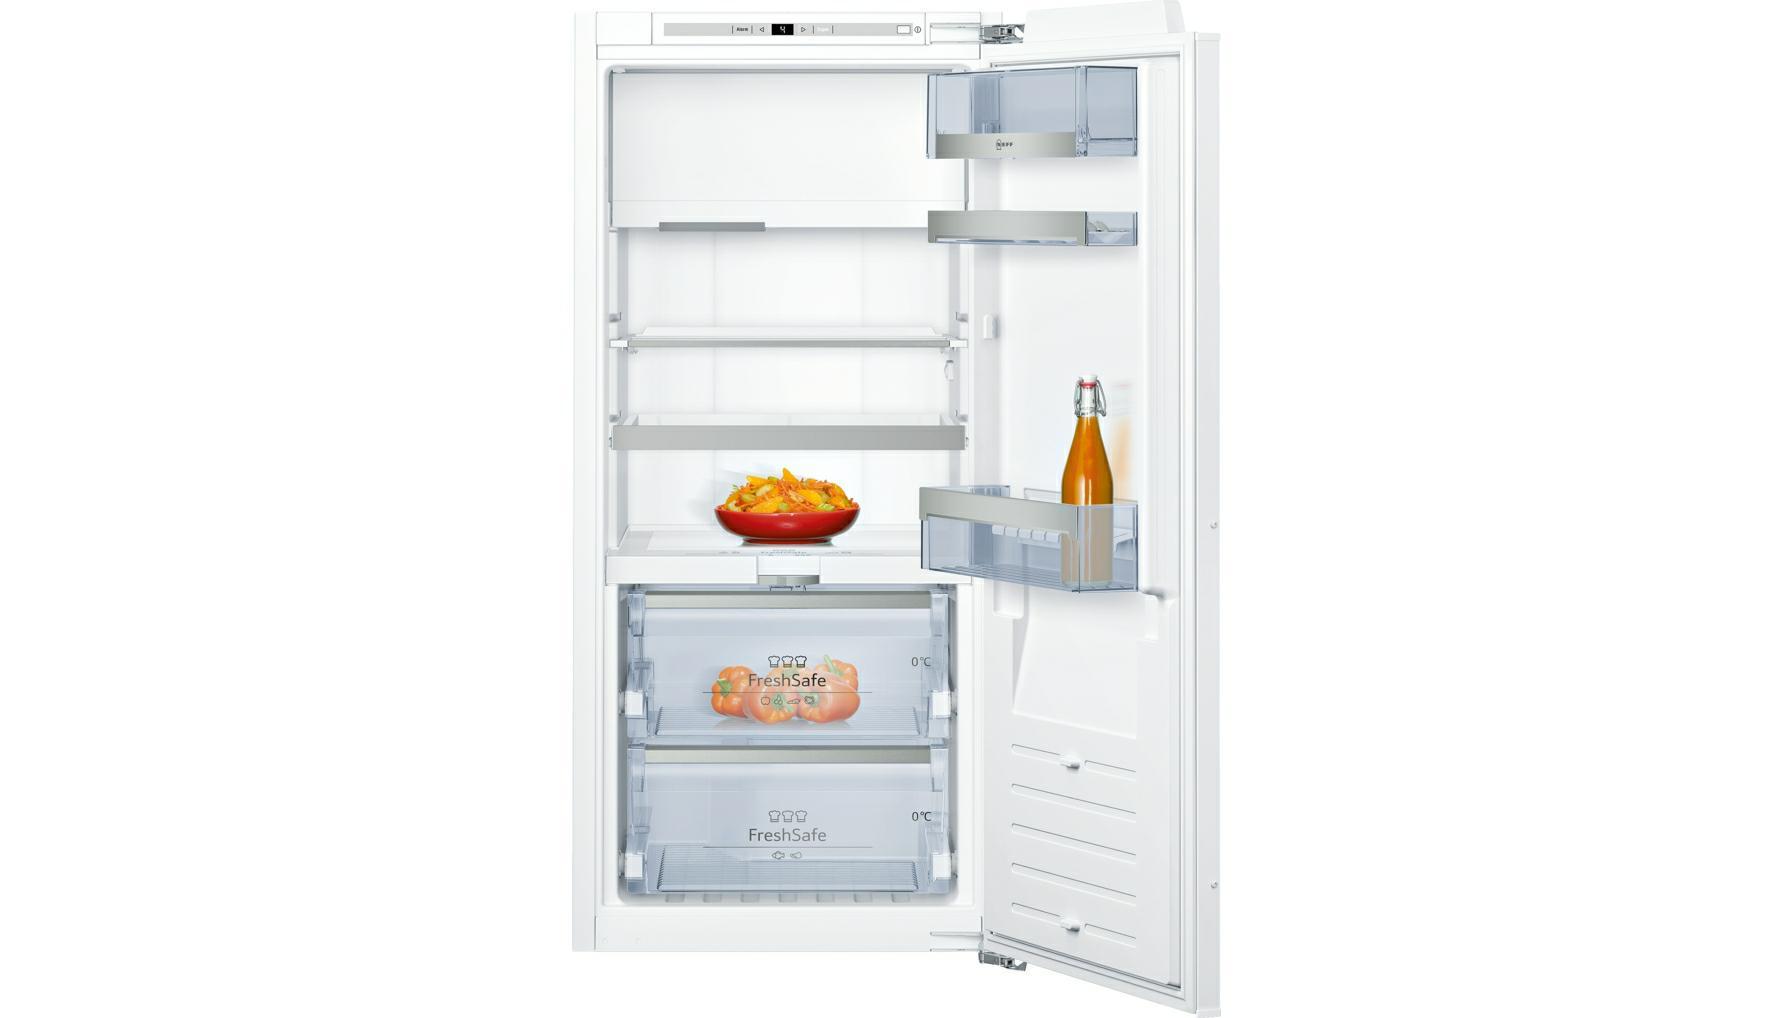 koelkast inbouw met vriesvak Neff KI8423D40 koelkast inbouw met vriesvak